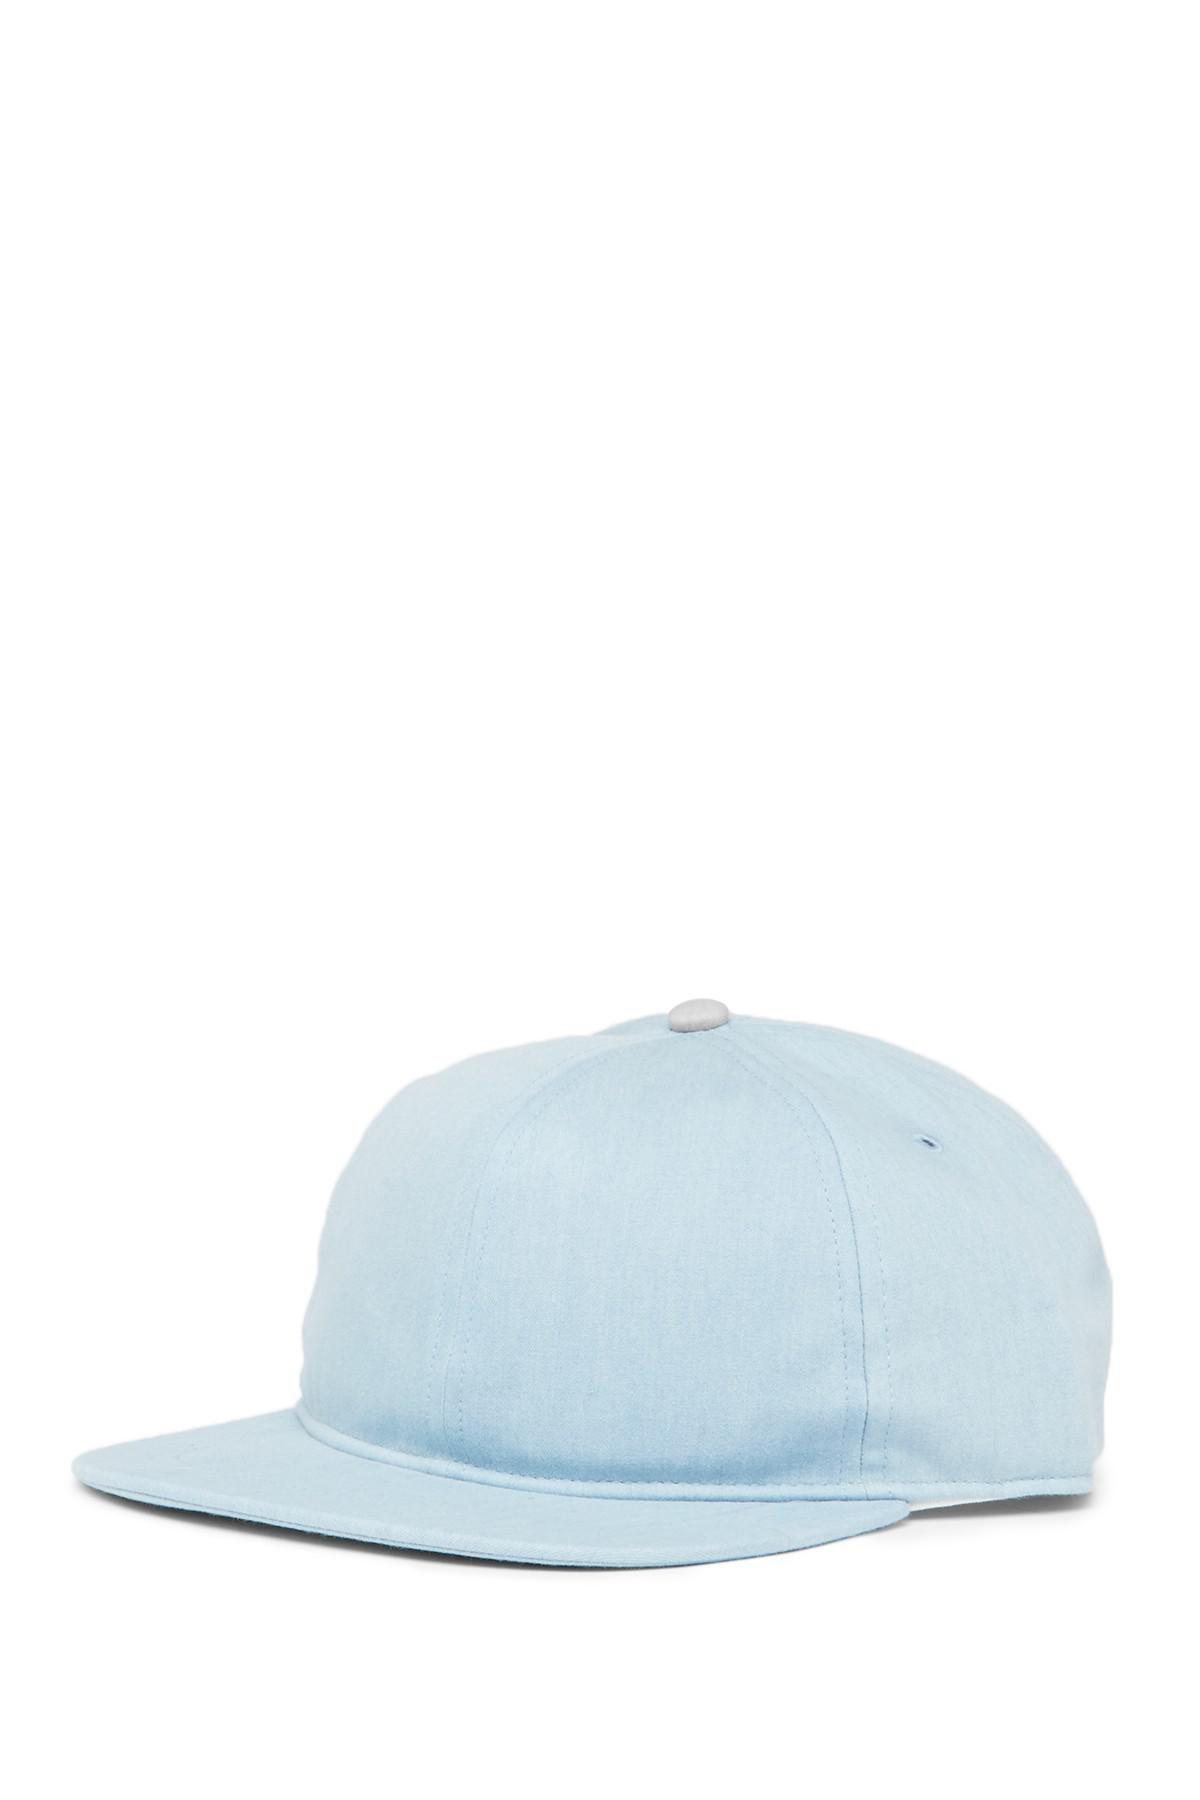 Lyst - Saturdays NYC Stanley Buckle Hat in Blue for Men 61c16dd39